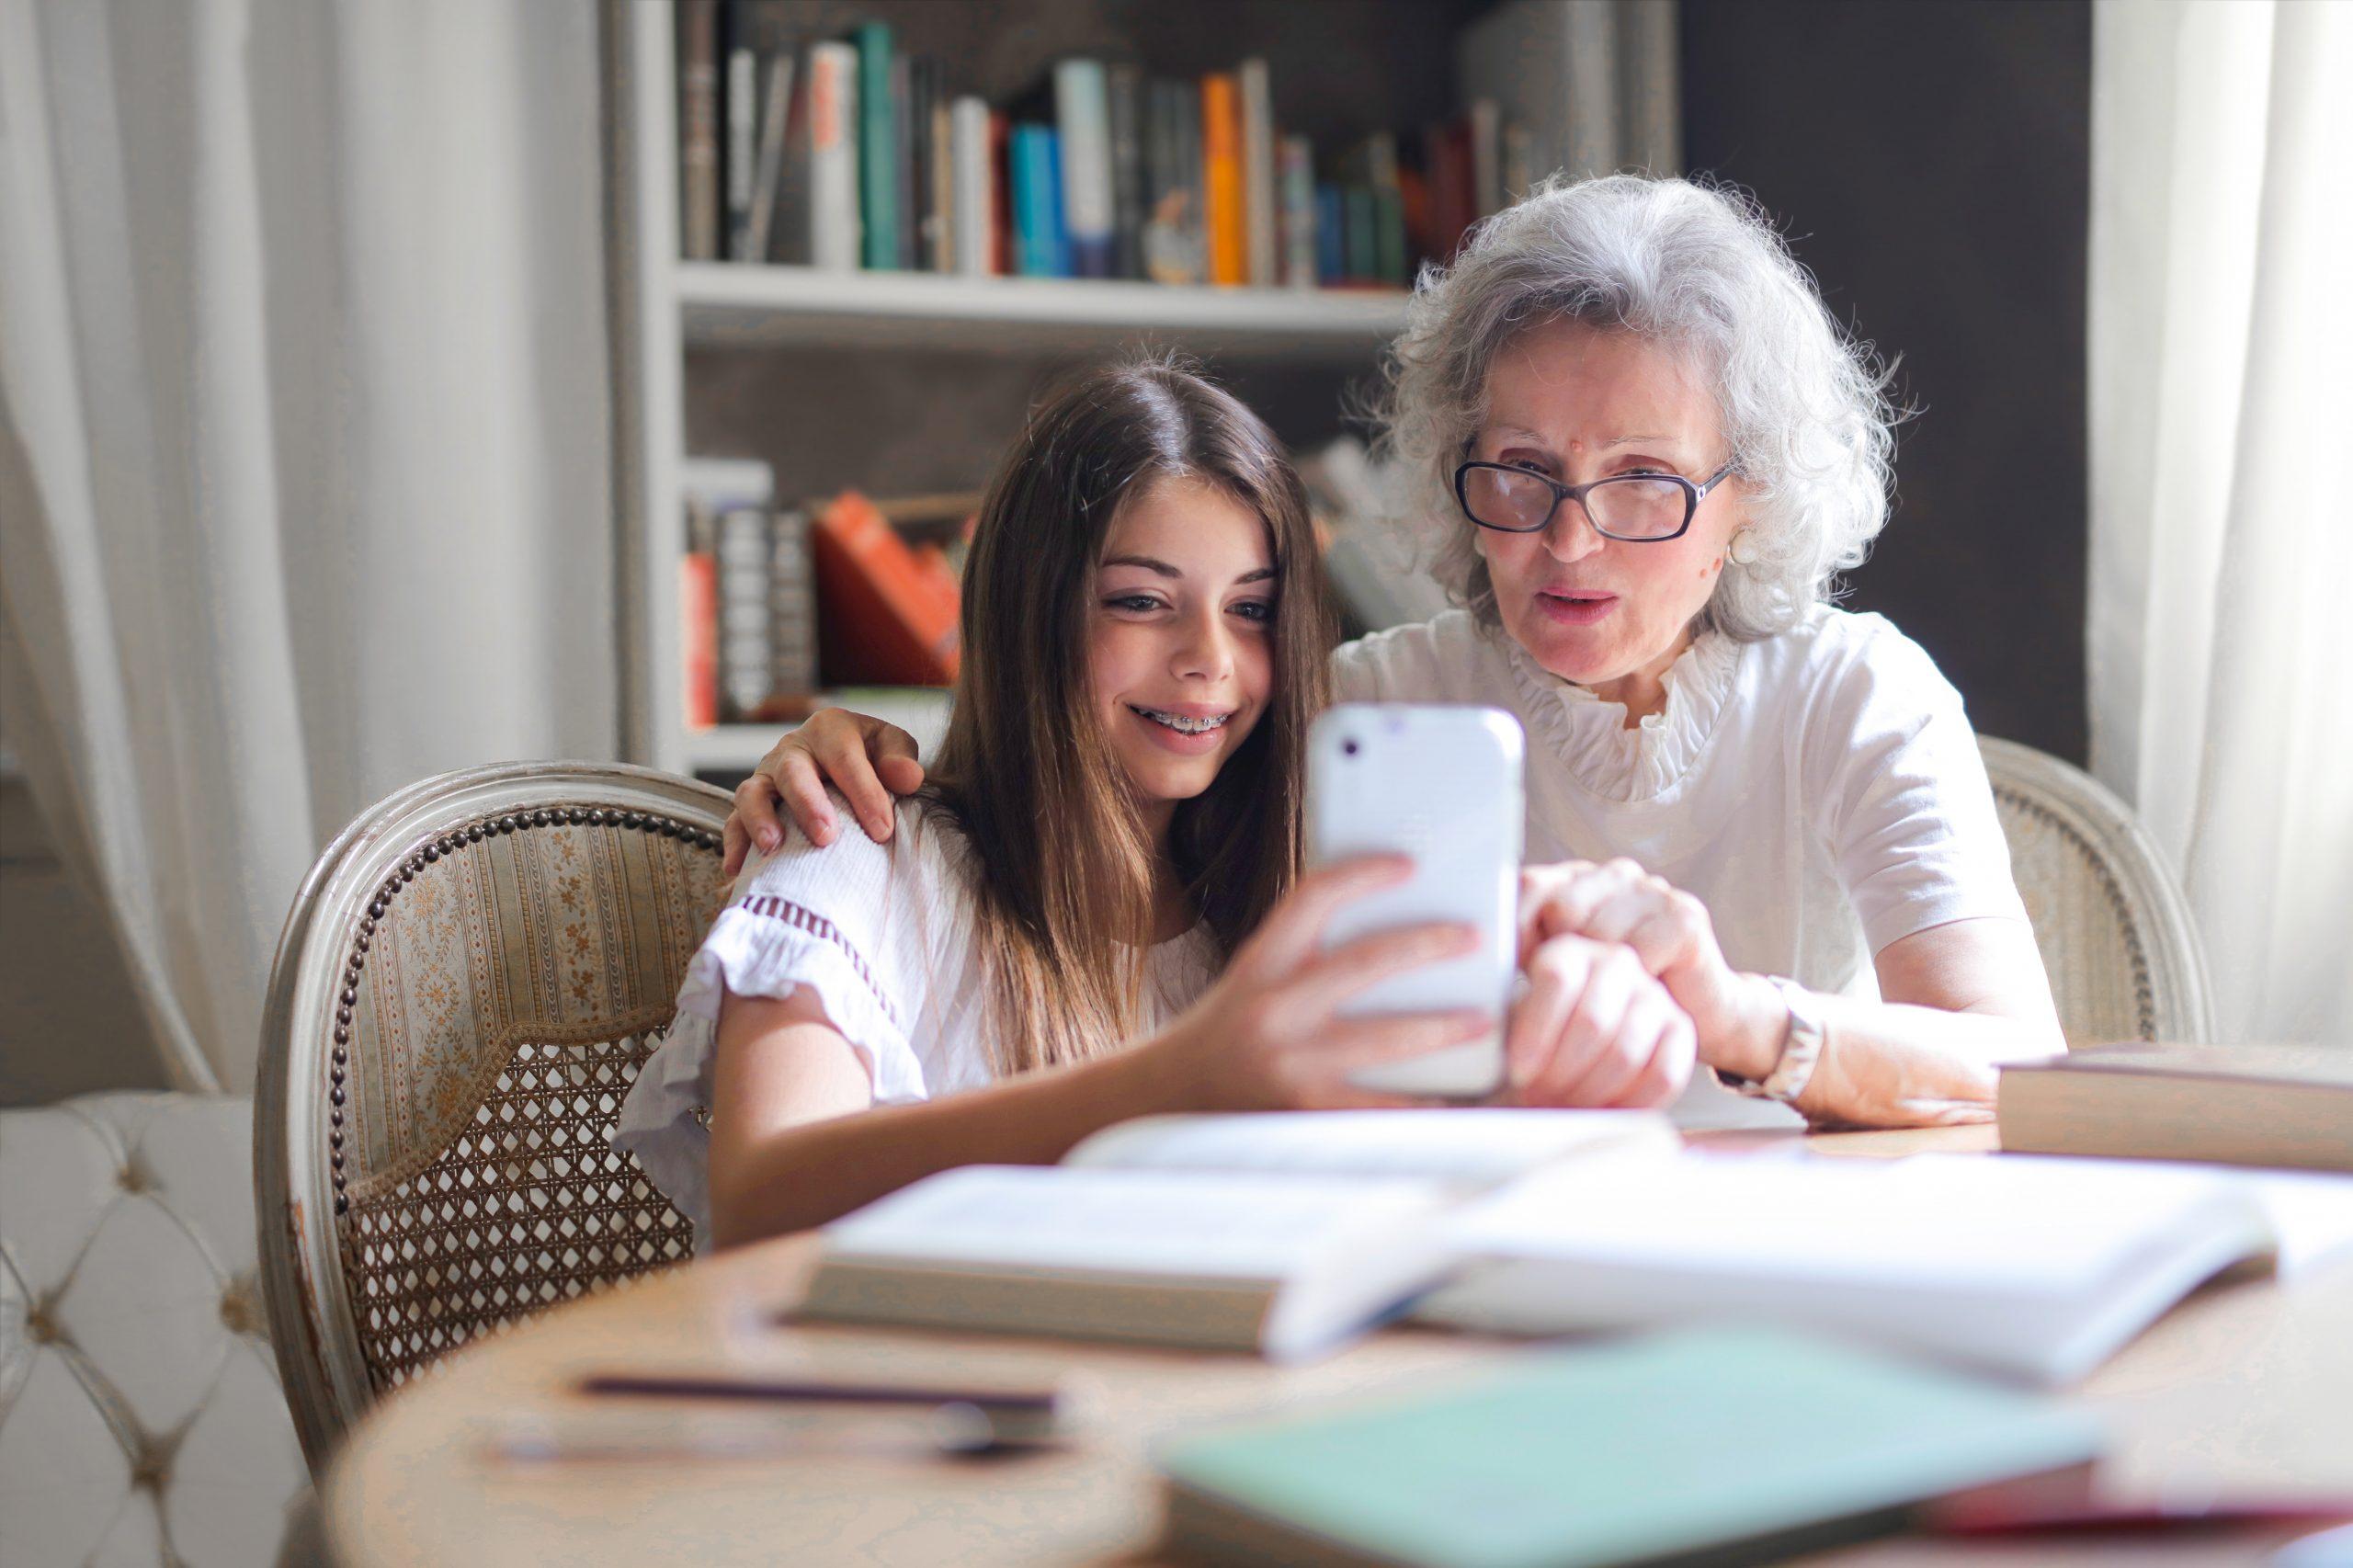 Grandparents in Kid's Life